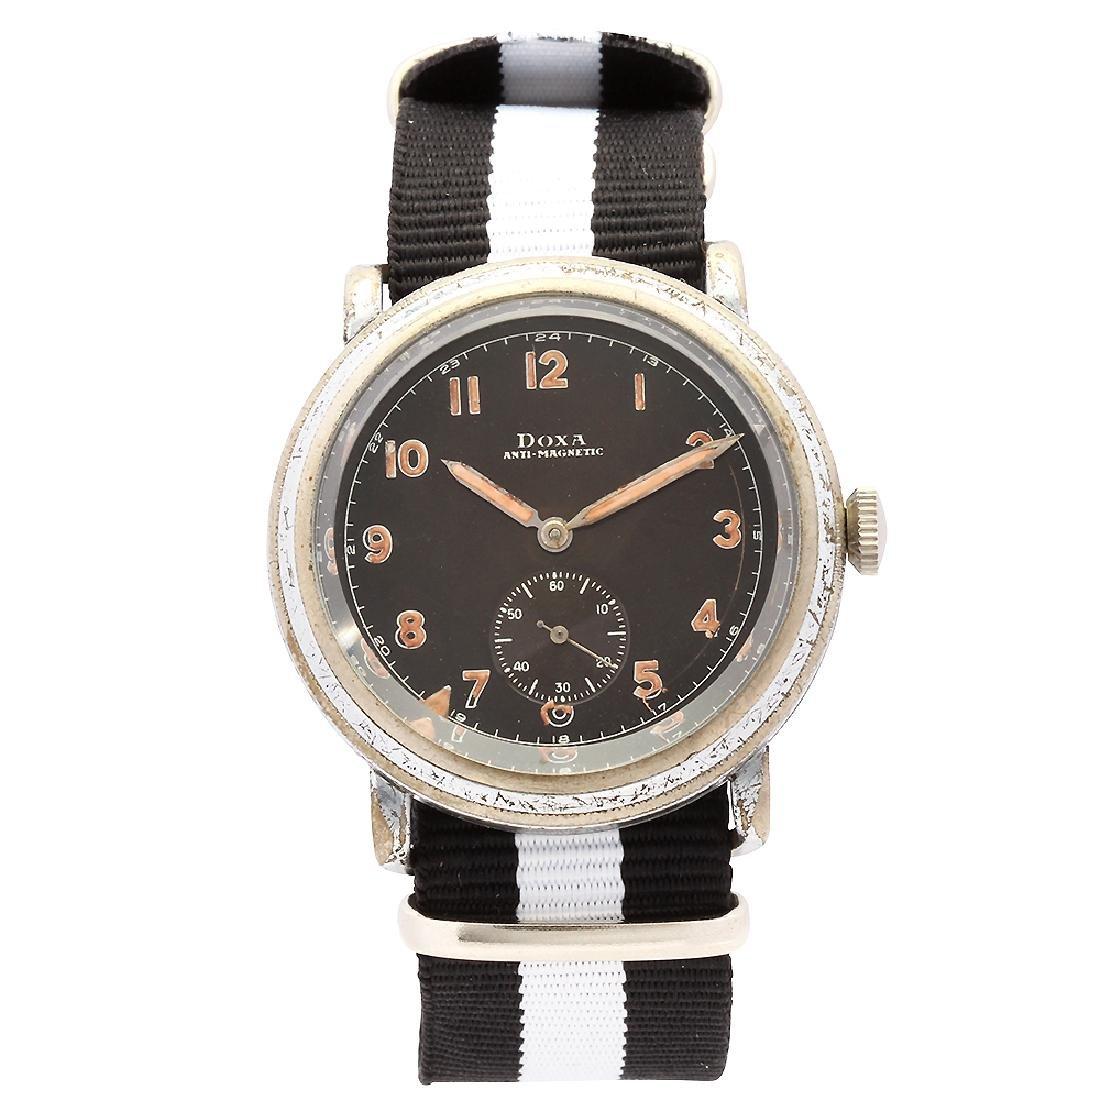 Pre WW2 Doxa Pilot's Watch Military Issue Fixed Lugs